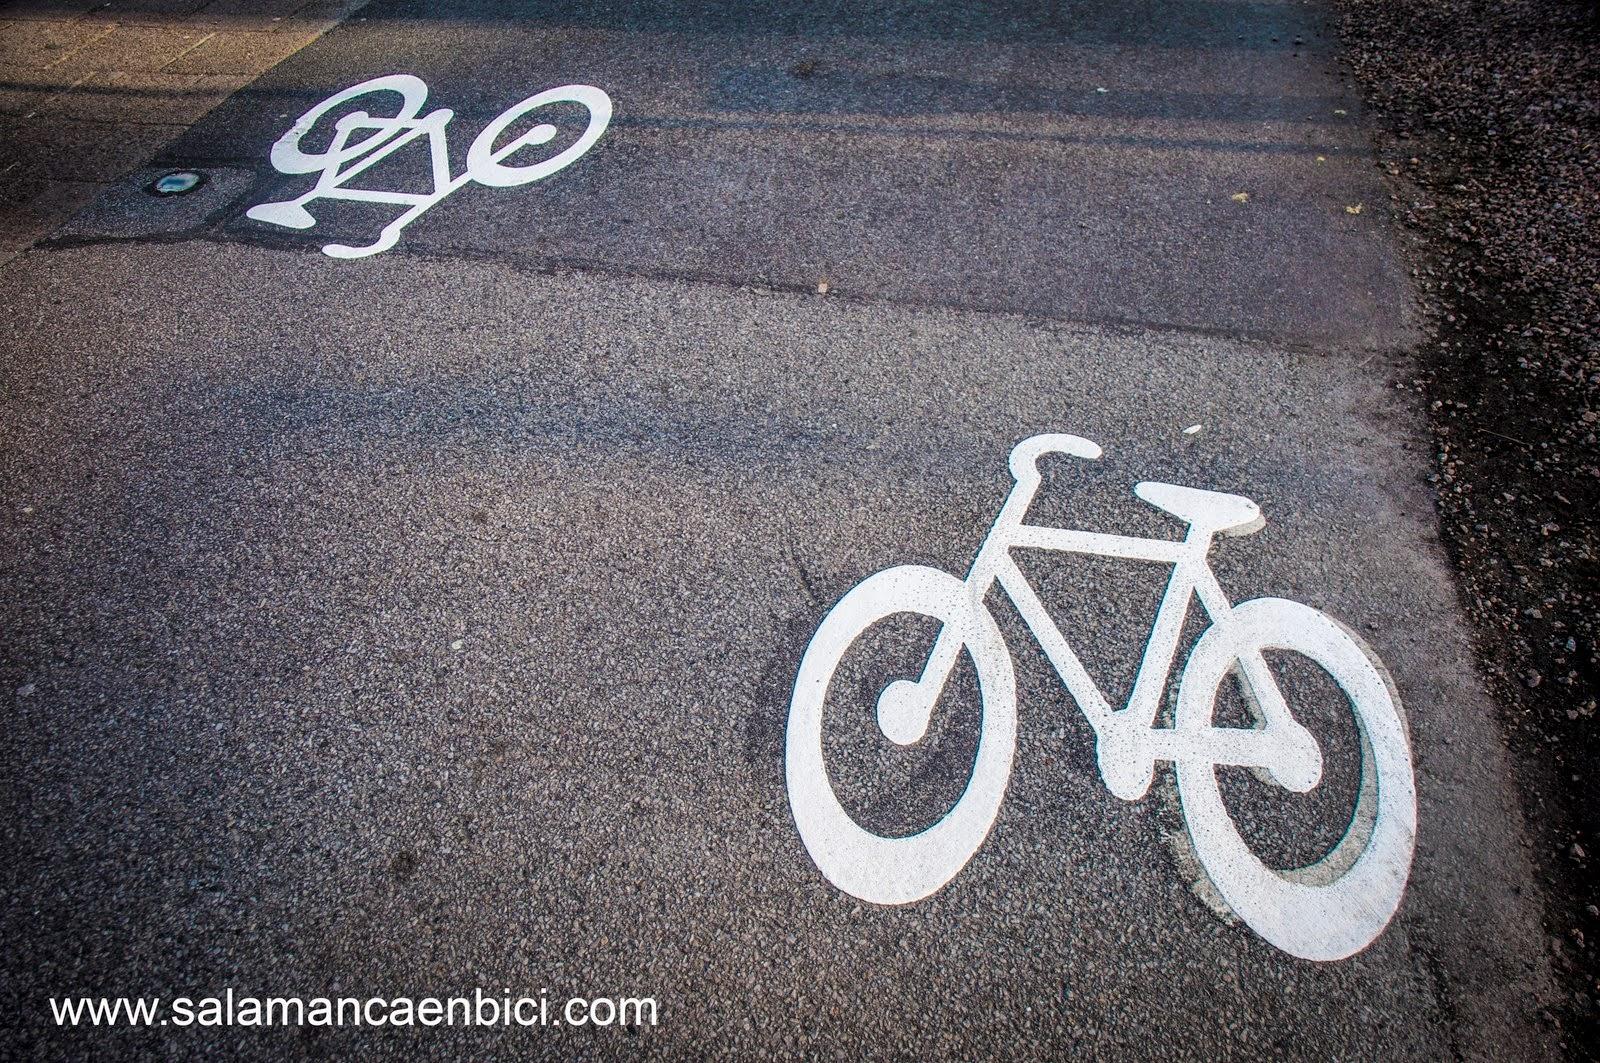 icono ciclista, bike icon, ciclyst icon